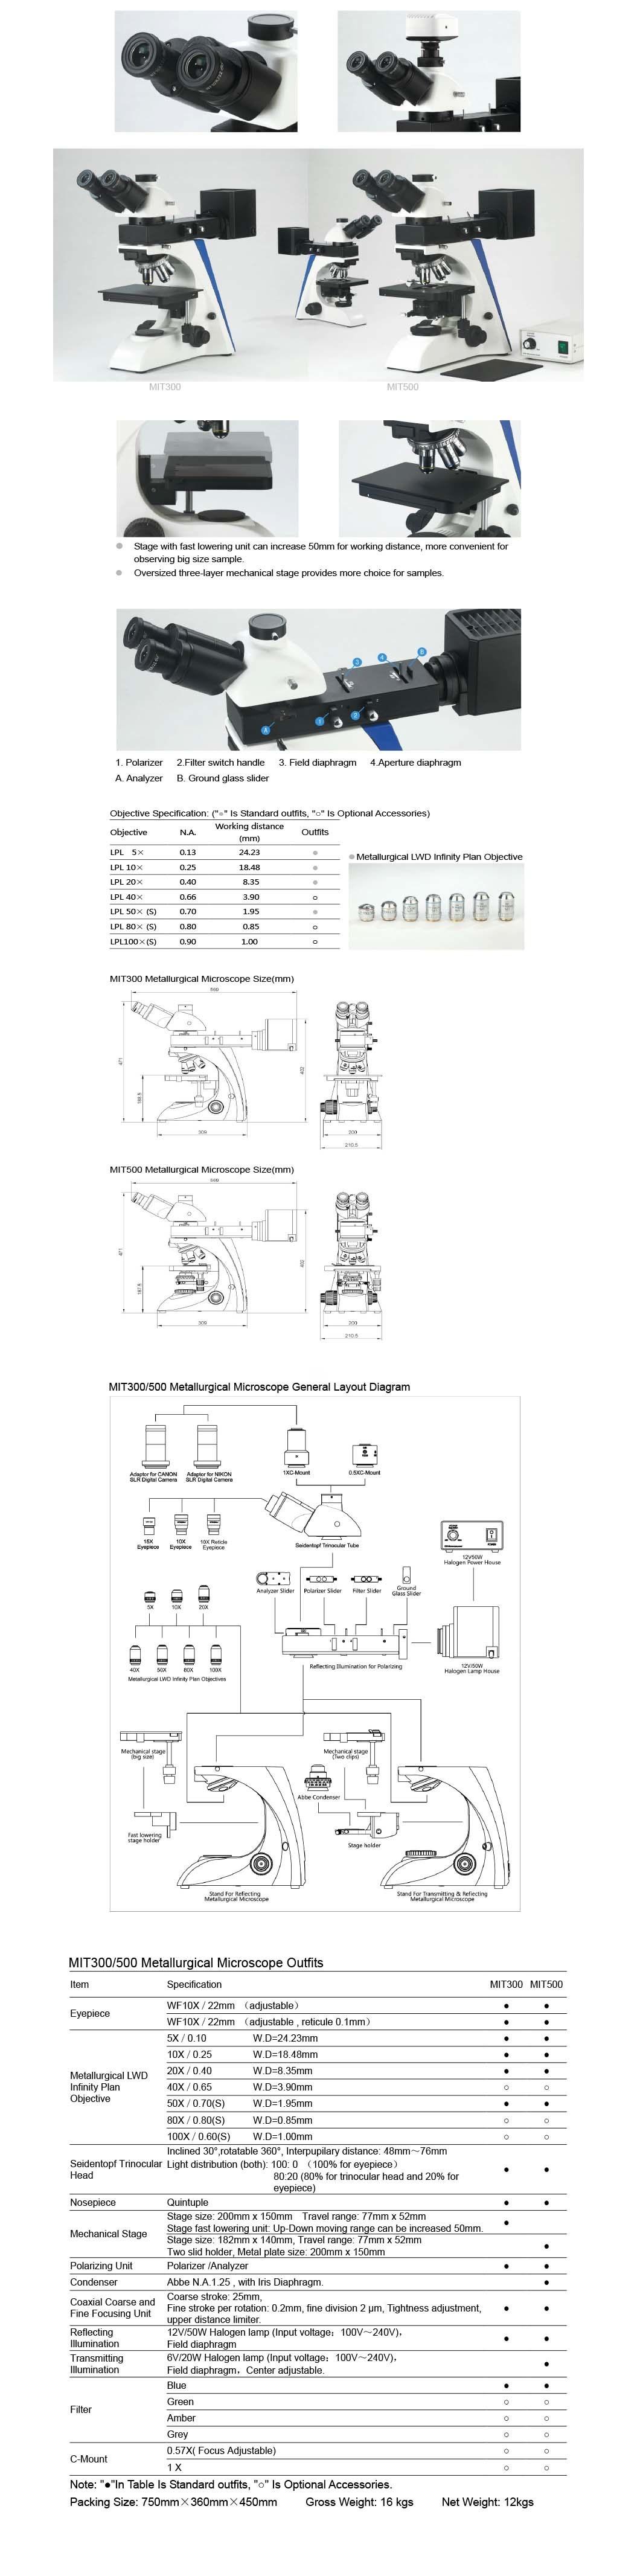 Metallurgical&Nbsp; Microscope with Mineralogy Microscopes Reflecting and Transmitting Illumination